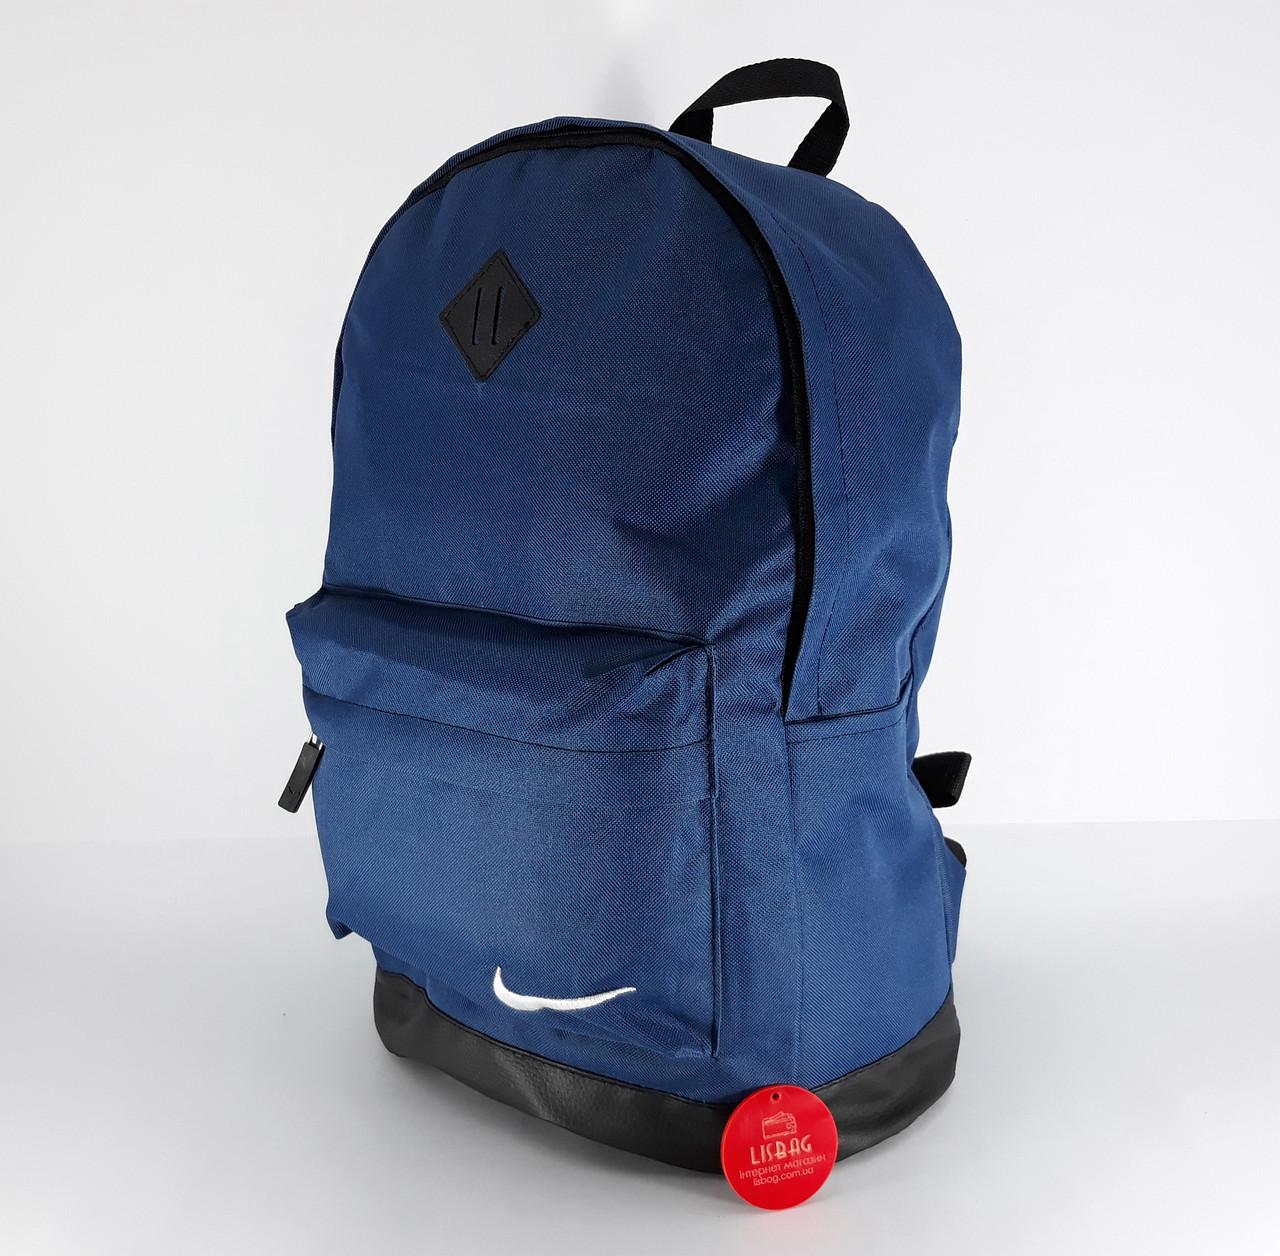 f3192d2ff678 Рюкзак темно-синий унисекс хорошего качества Nike реплика: продажа ...